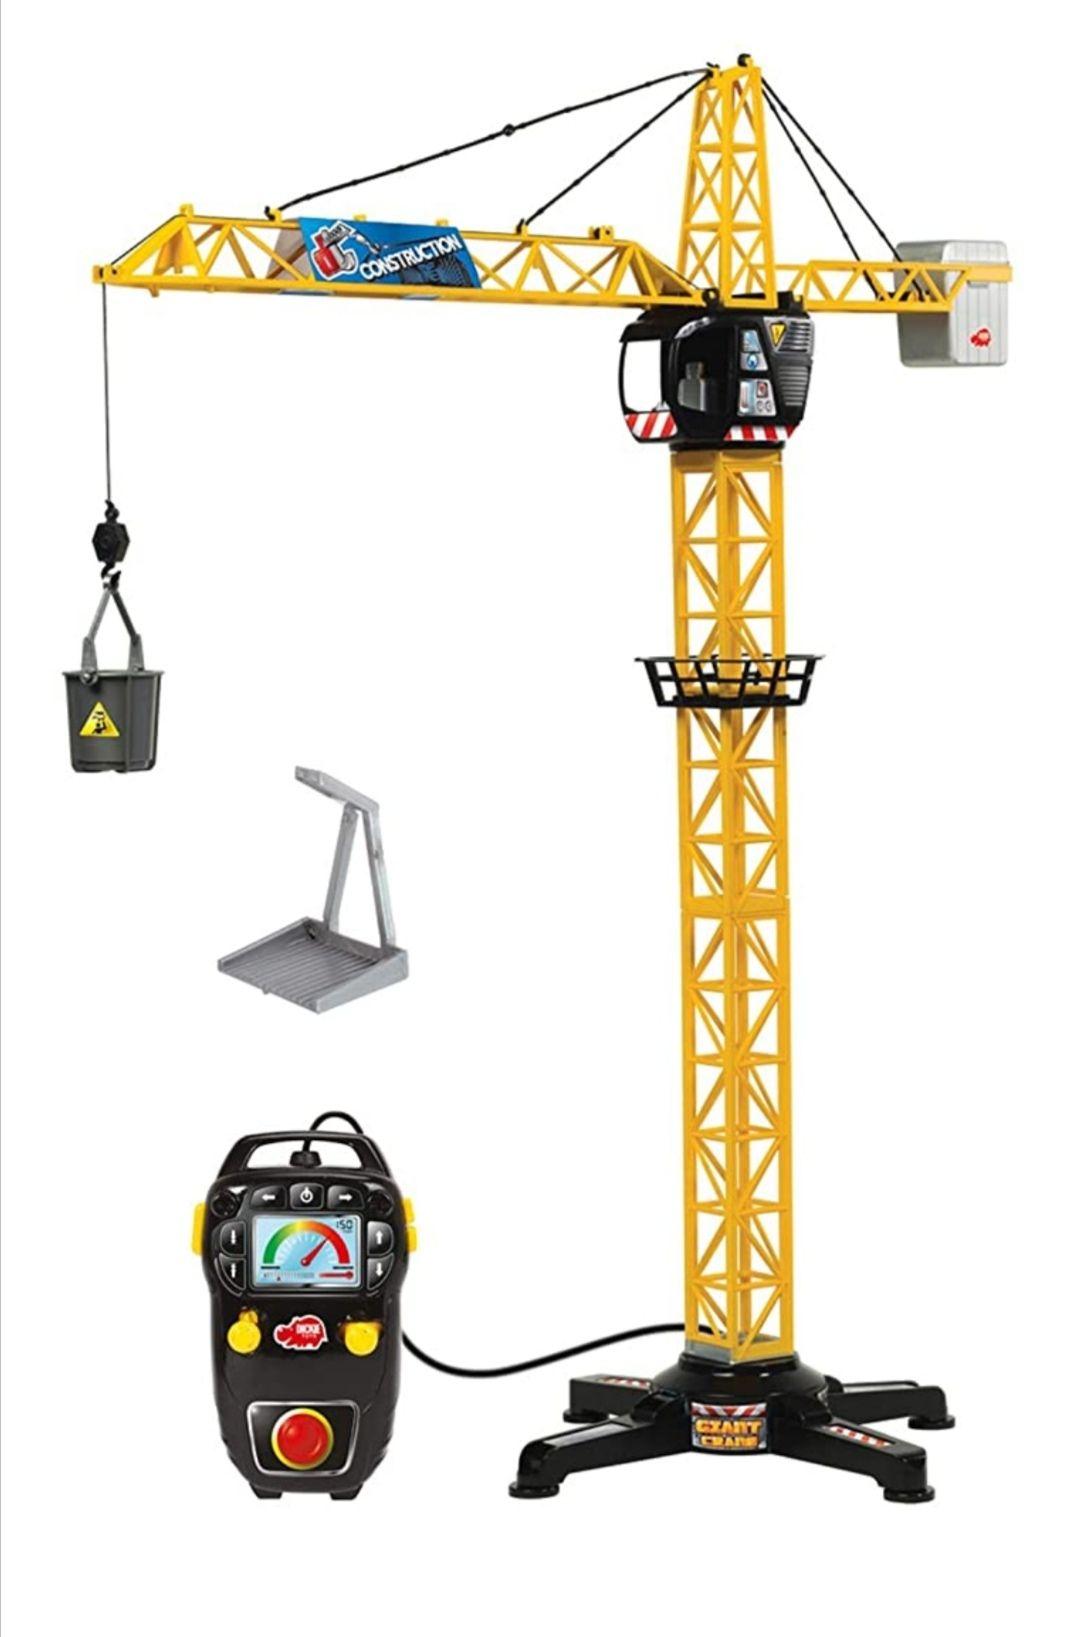 Dickie Toys Giant Crane *1Meter hoog* Amazon & Bol